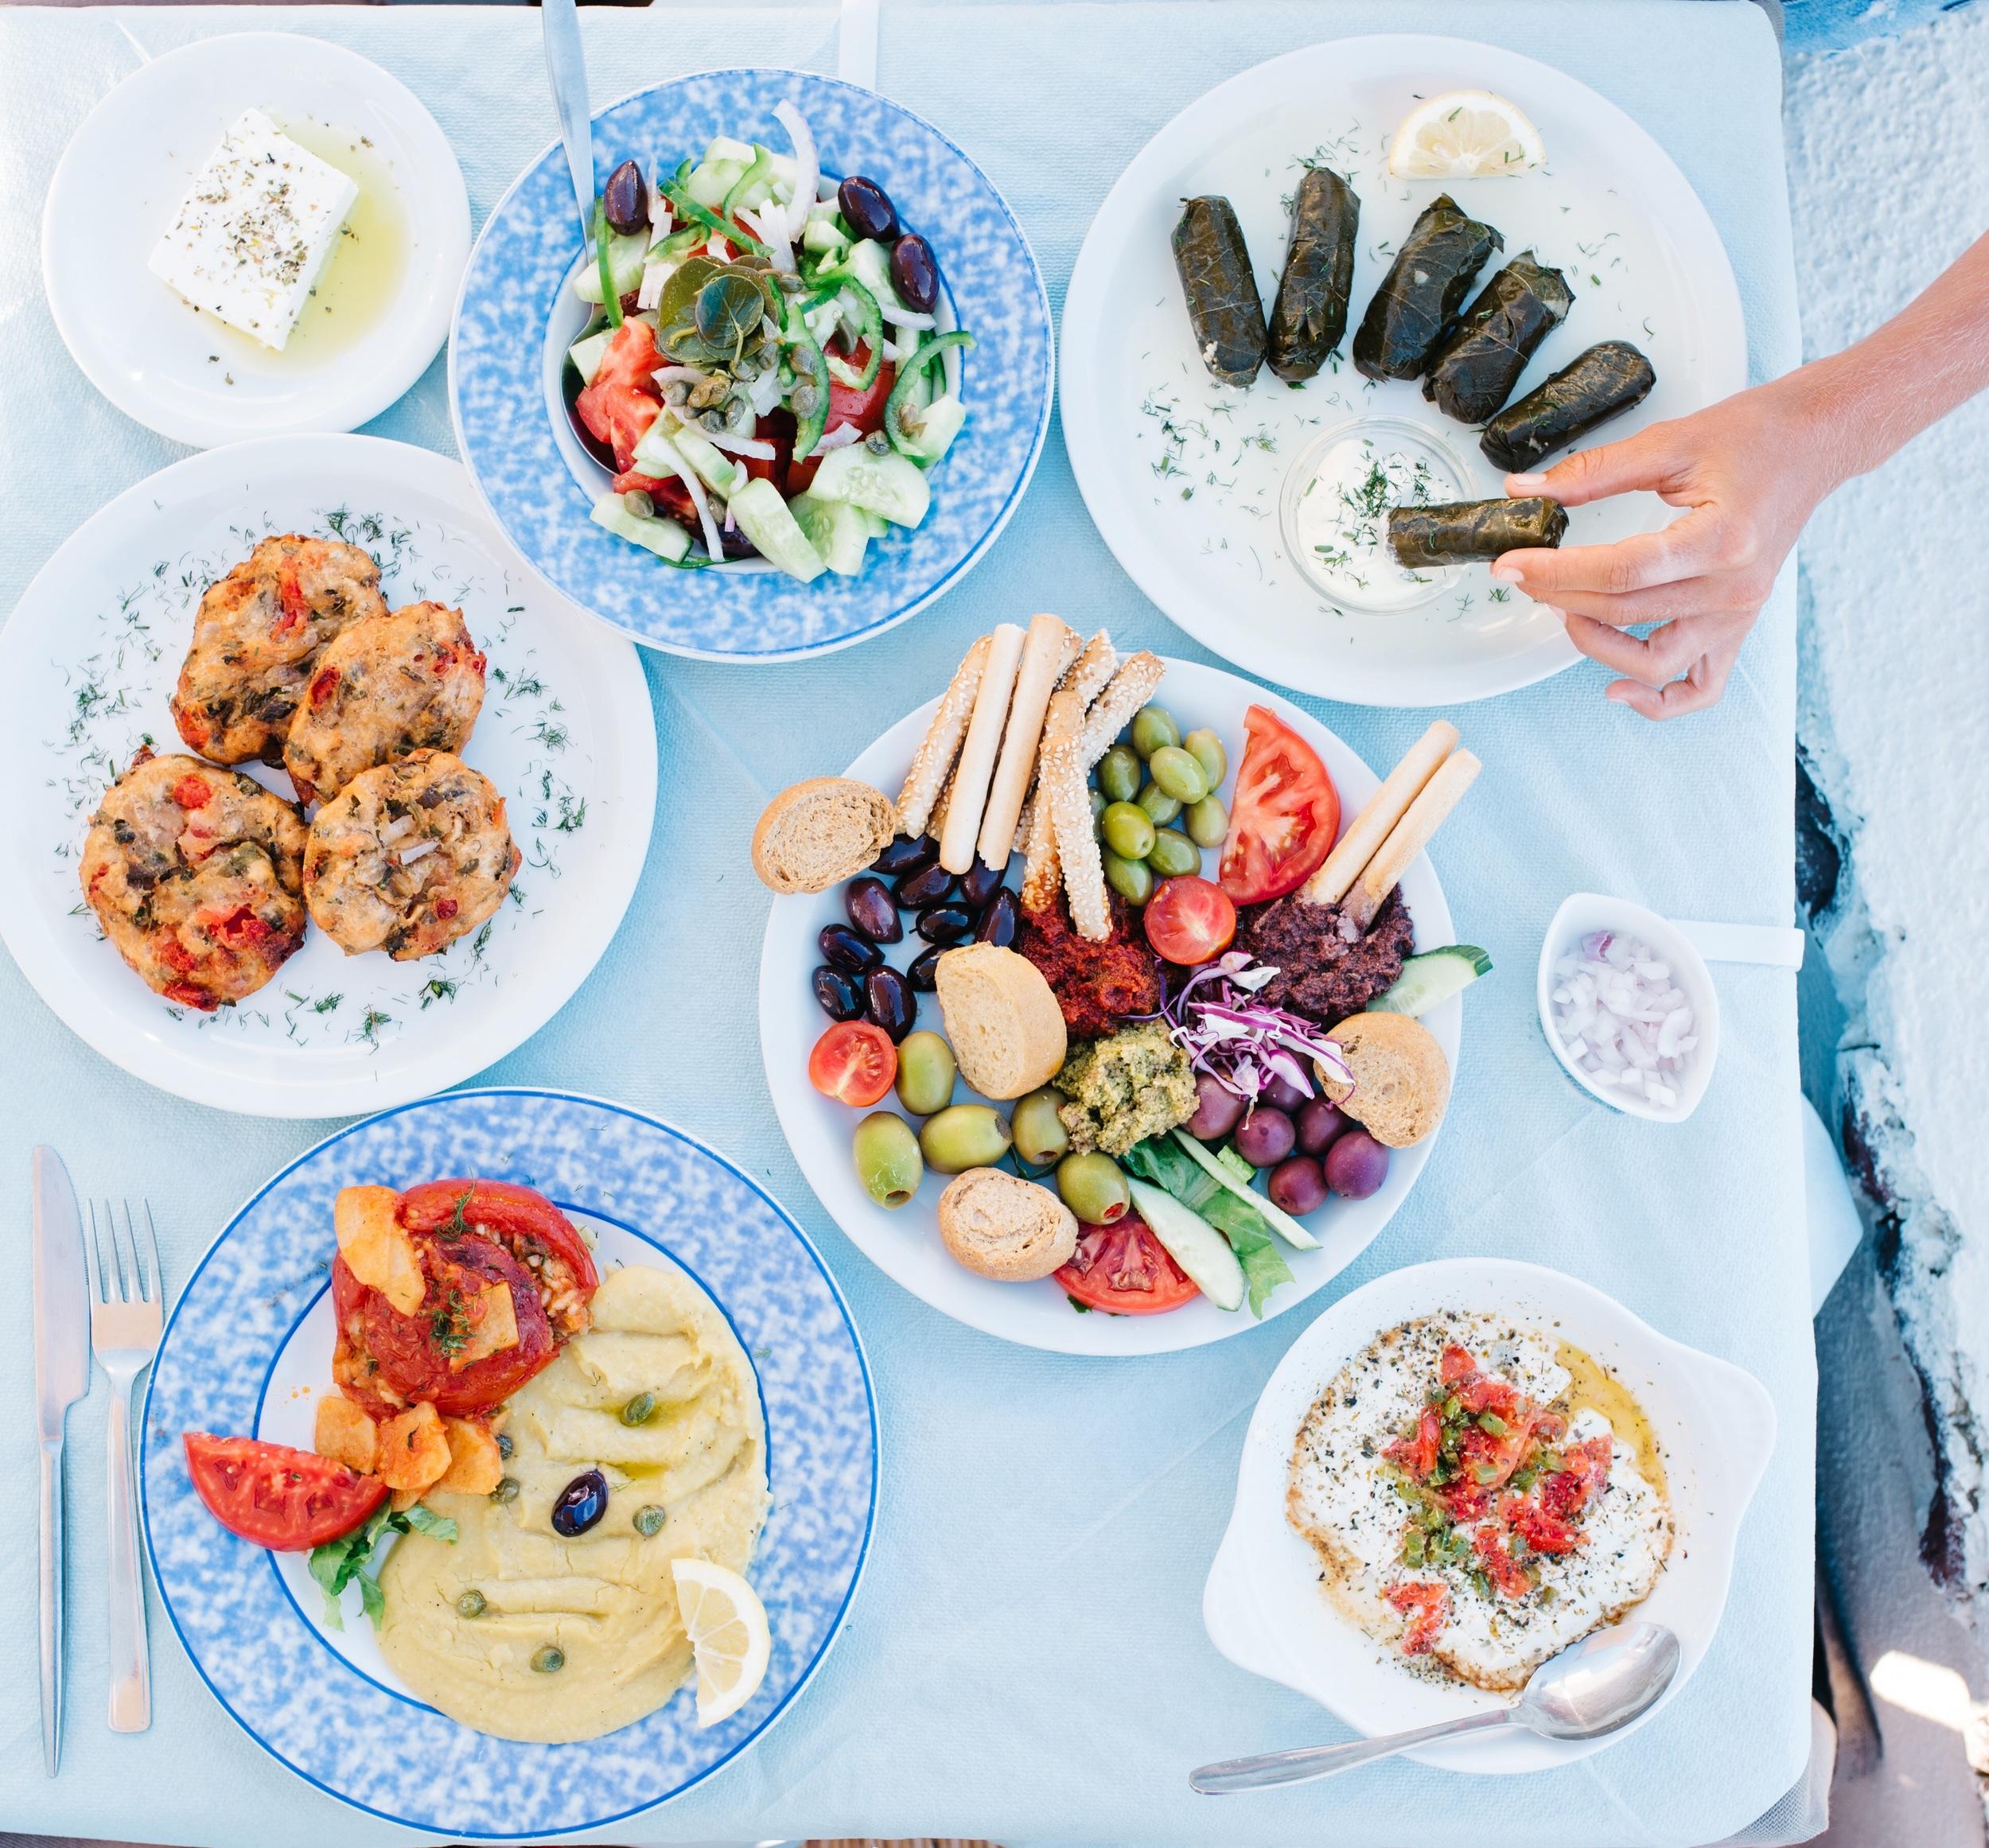 Greek spread: fava, tomato balls, feta, Greek salad, olive and dip plate, Dolmades, baked feta